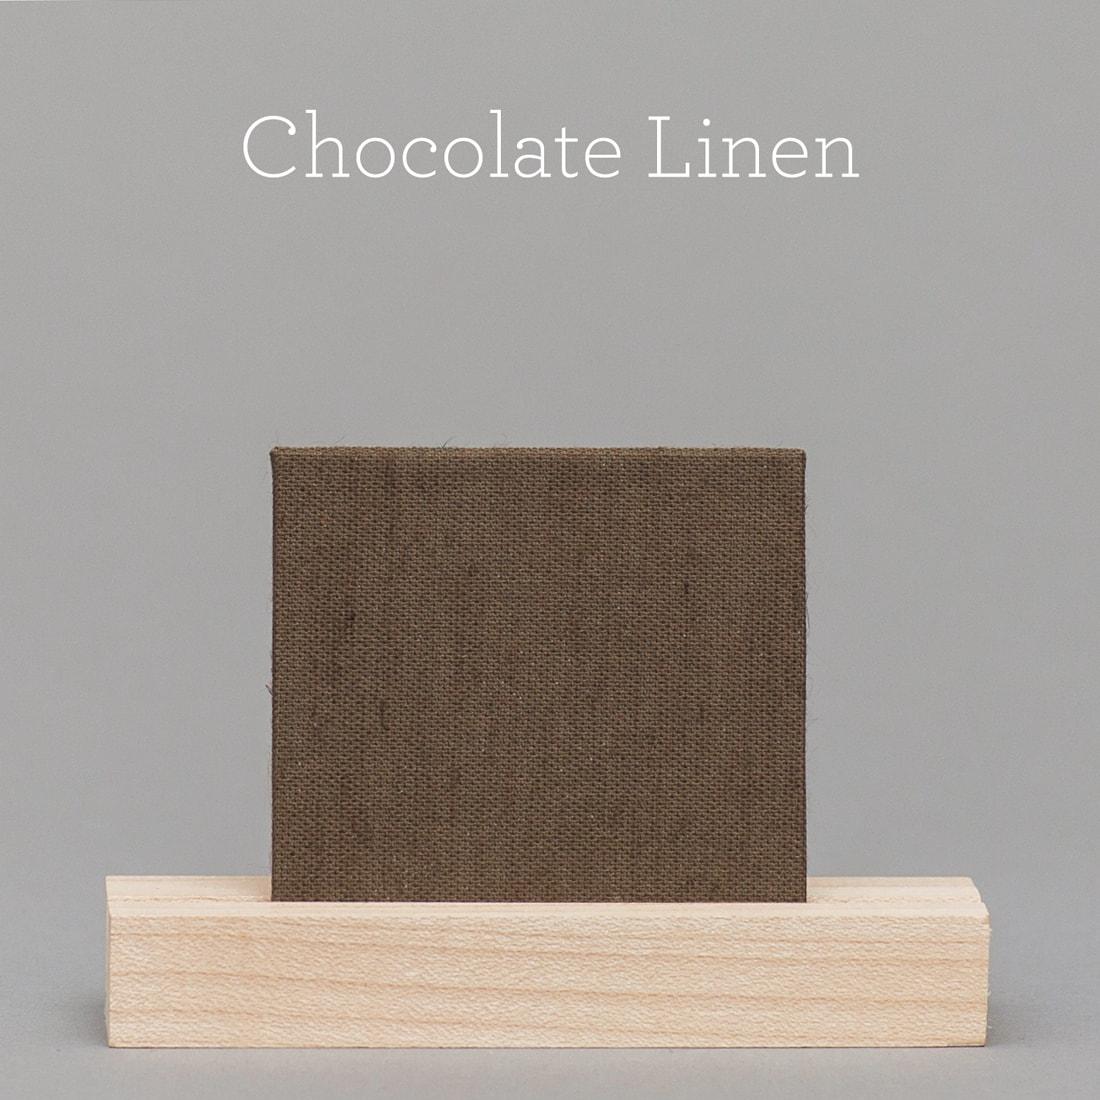 ChocolateLinen.jpg